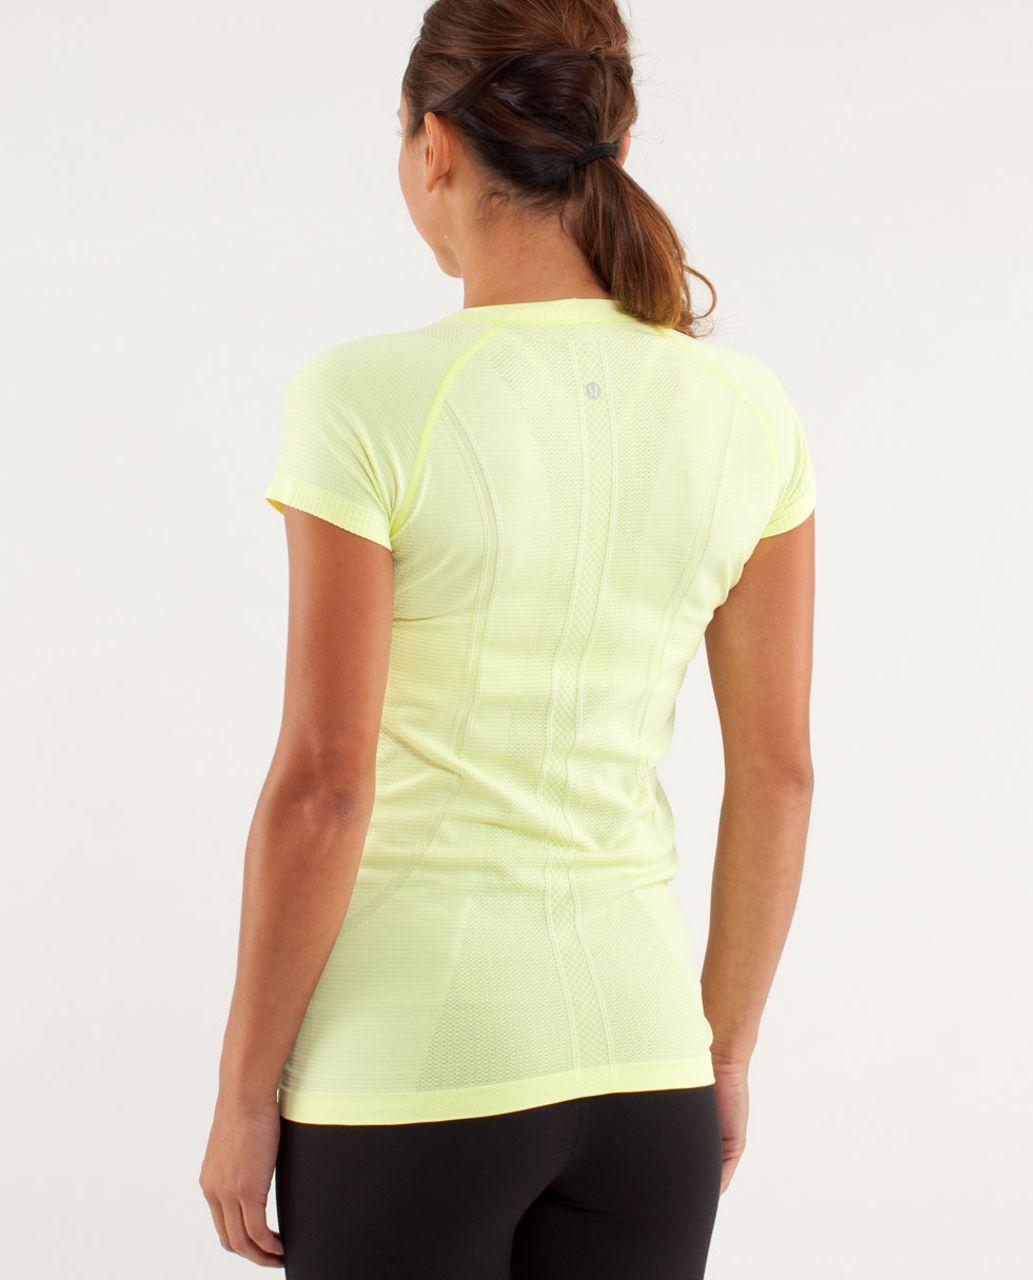 Lululemon Run:  Swiftly Tech Short Sleeve - Clarity Yellow